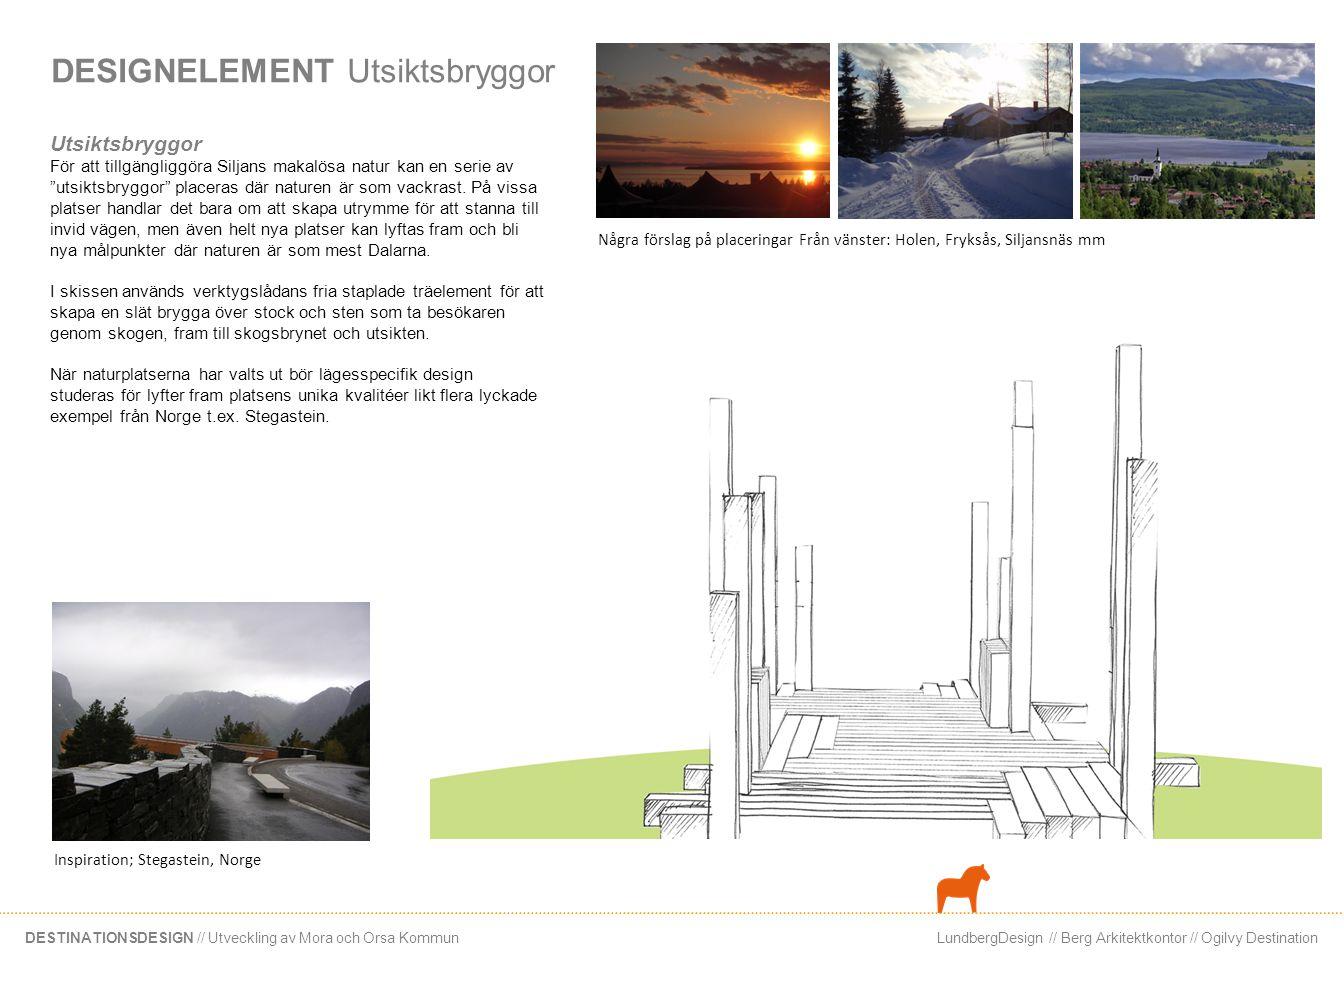 LundbergDesign // Berg Arkitektkontor // Ogilvy DestinationDESTINATIONSDESIGN // Utveckling av Mora och Orsa Kommun DESIGNELEMENT Utsiktsbryggor Utsik